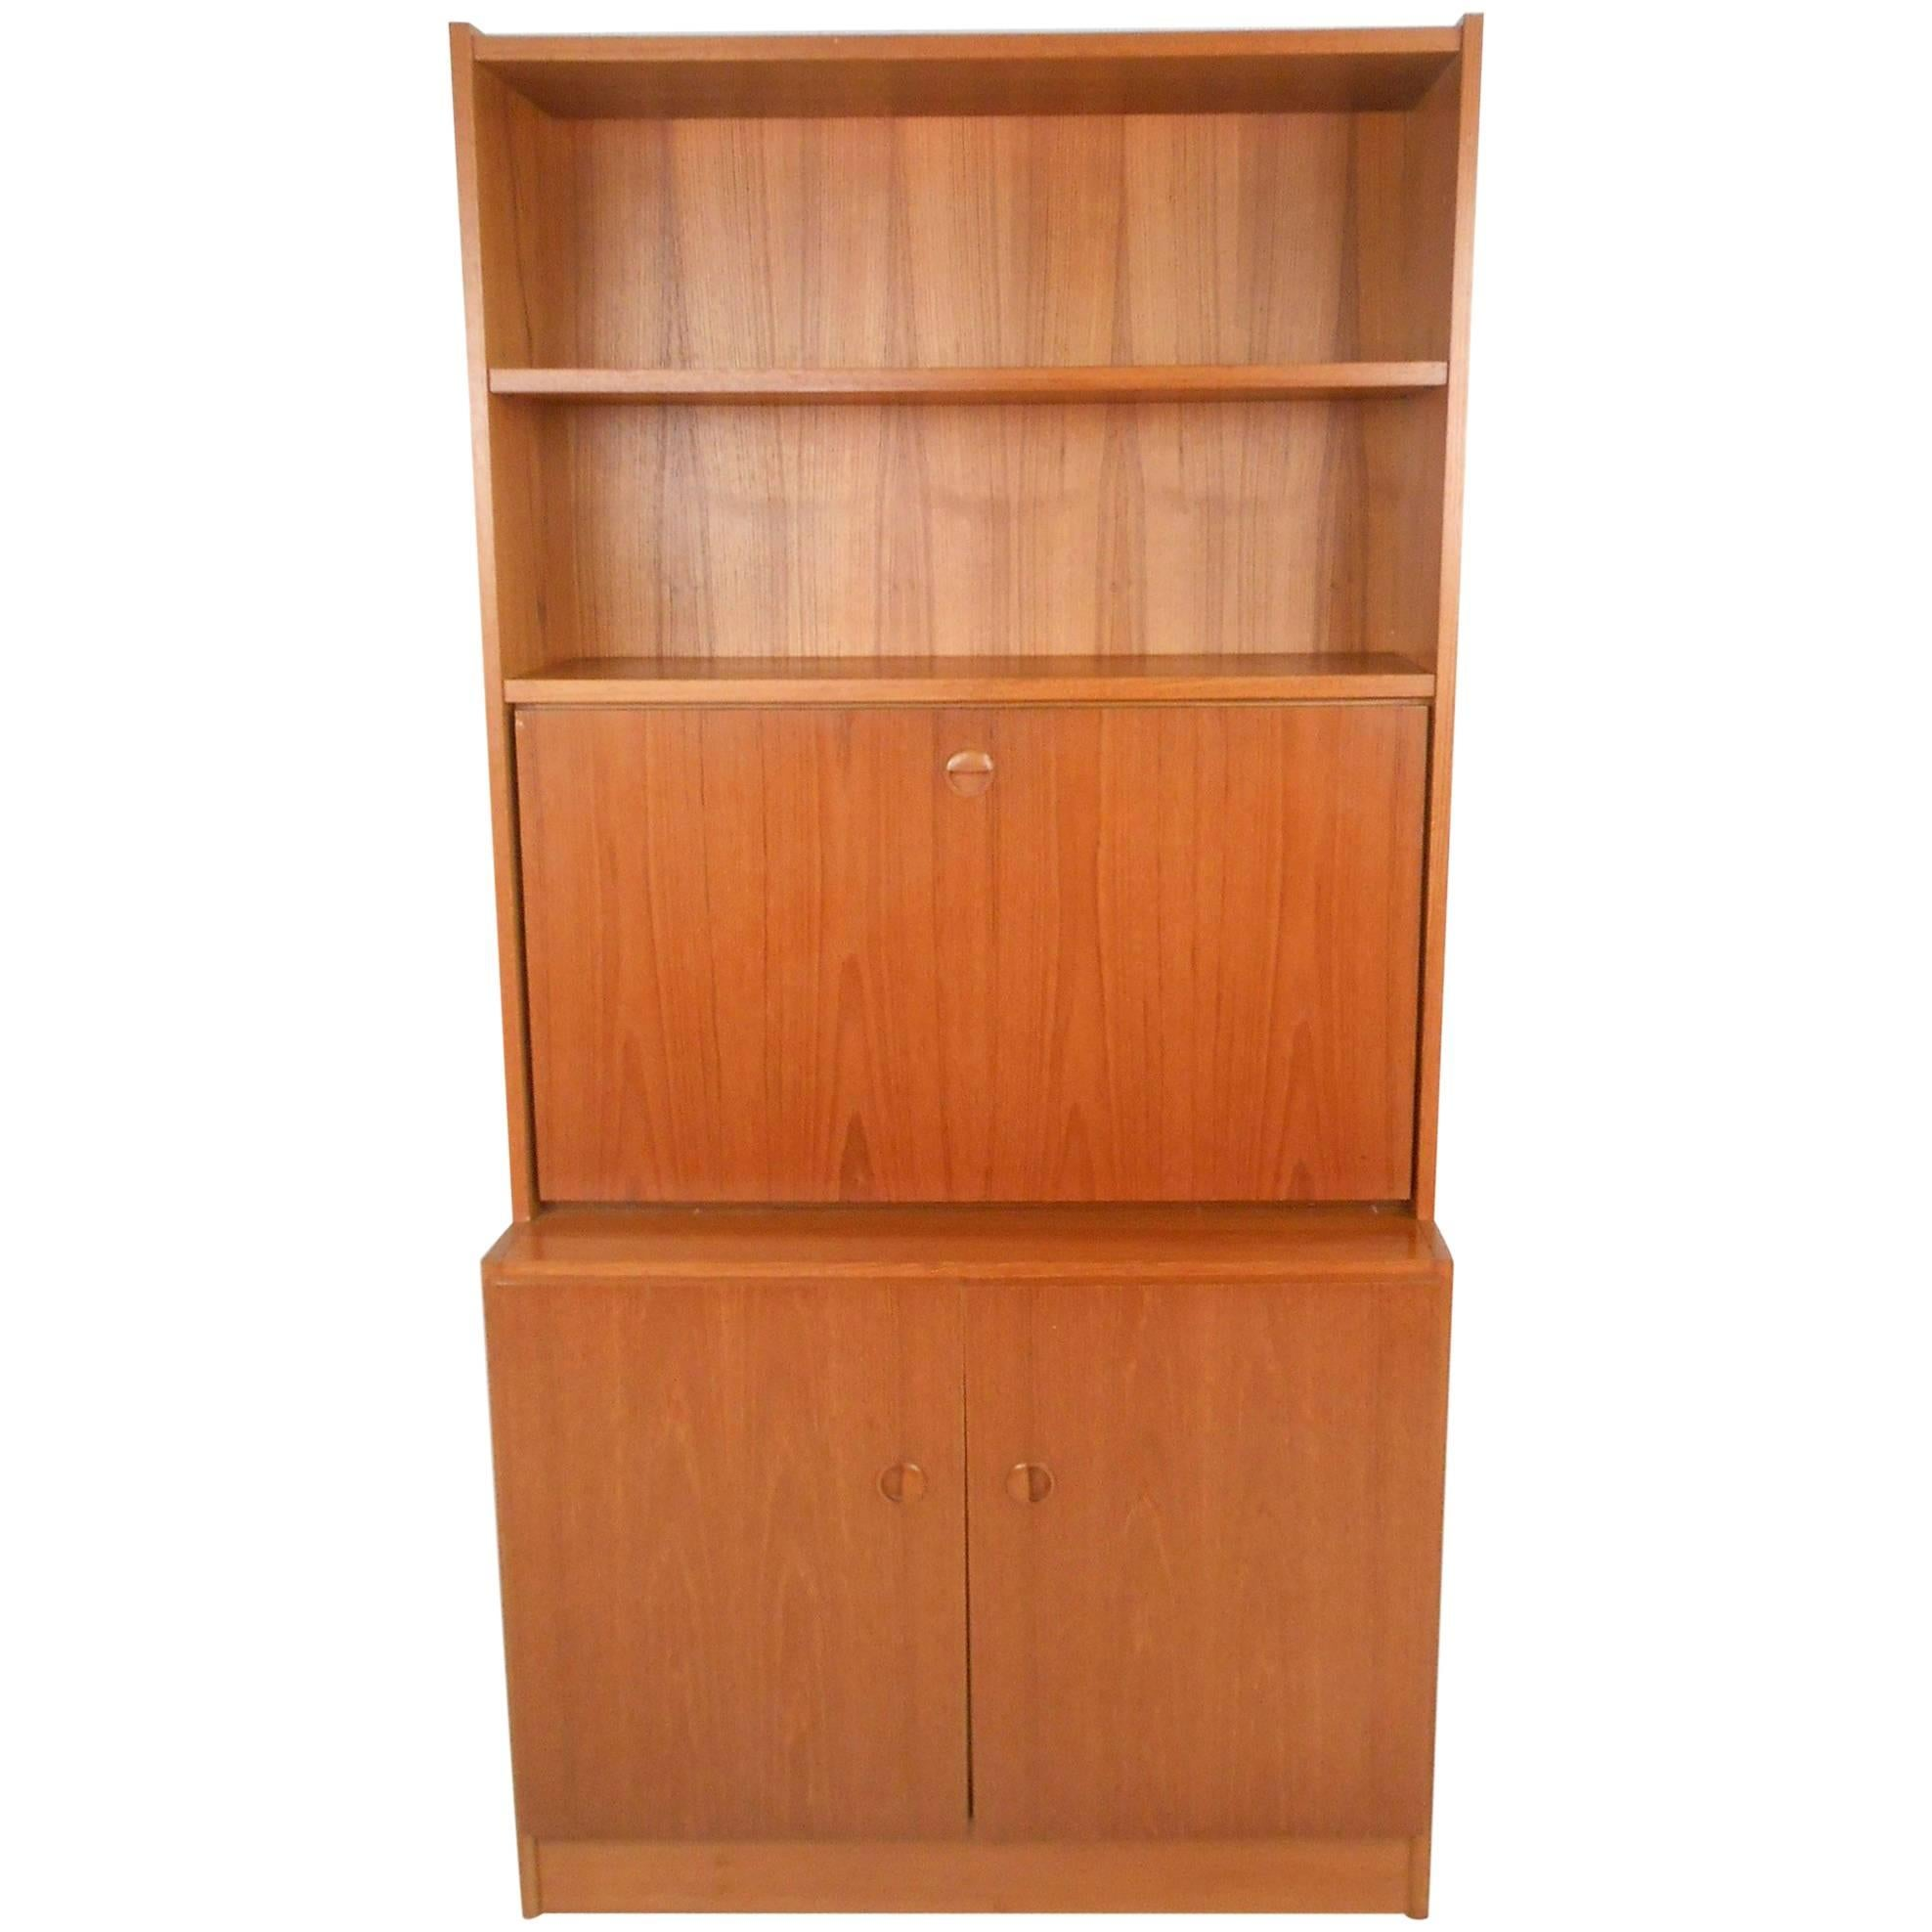 of shelf bookshelf collins furniture tier medium locker pin weathered america brown display oak industrial